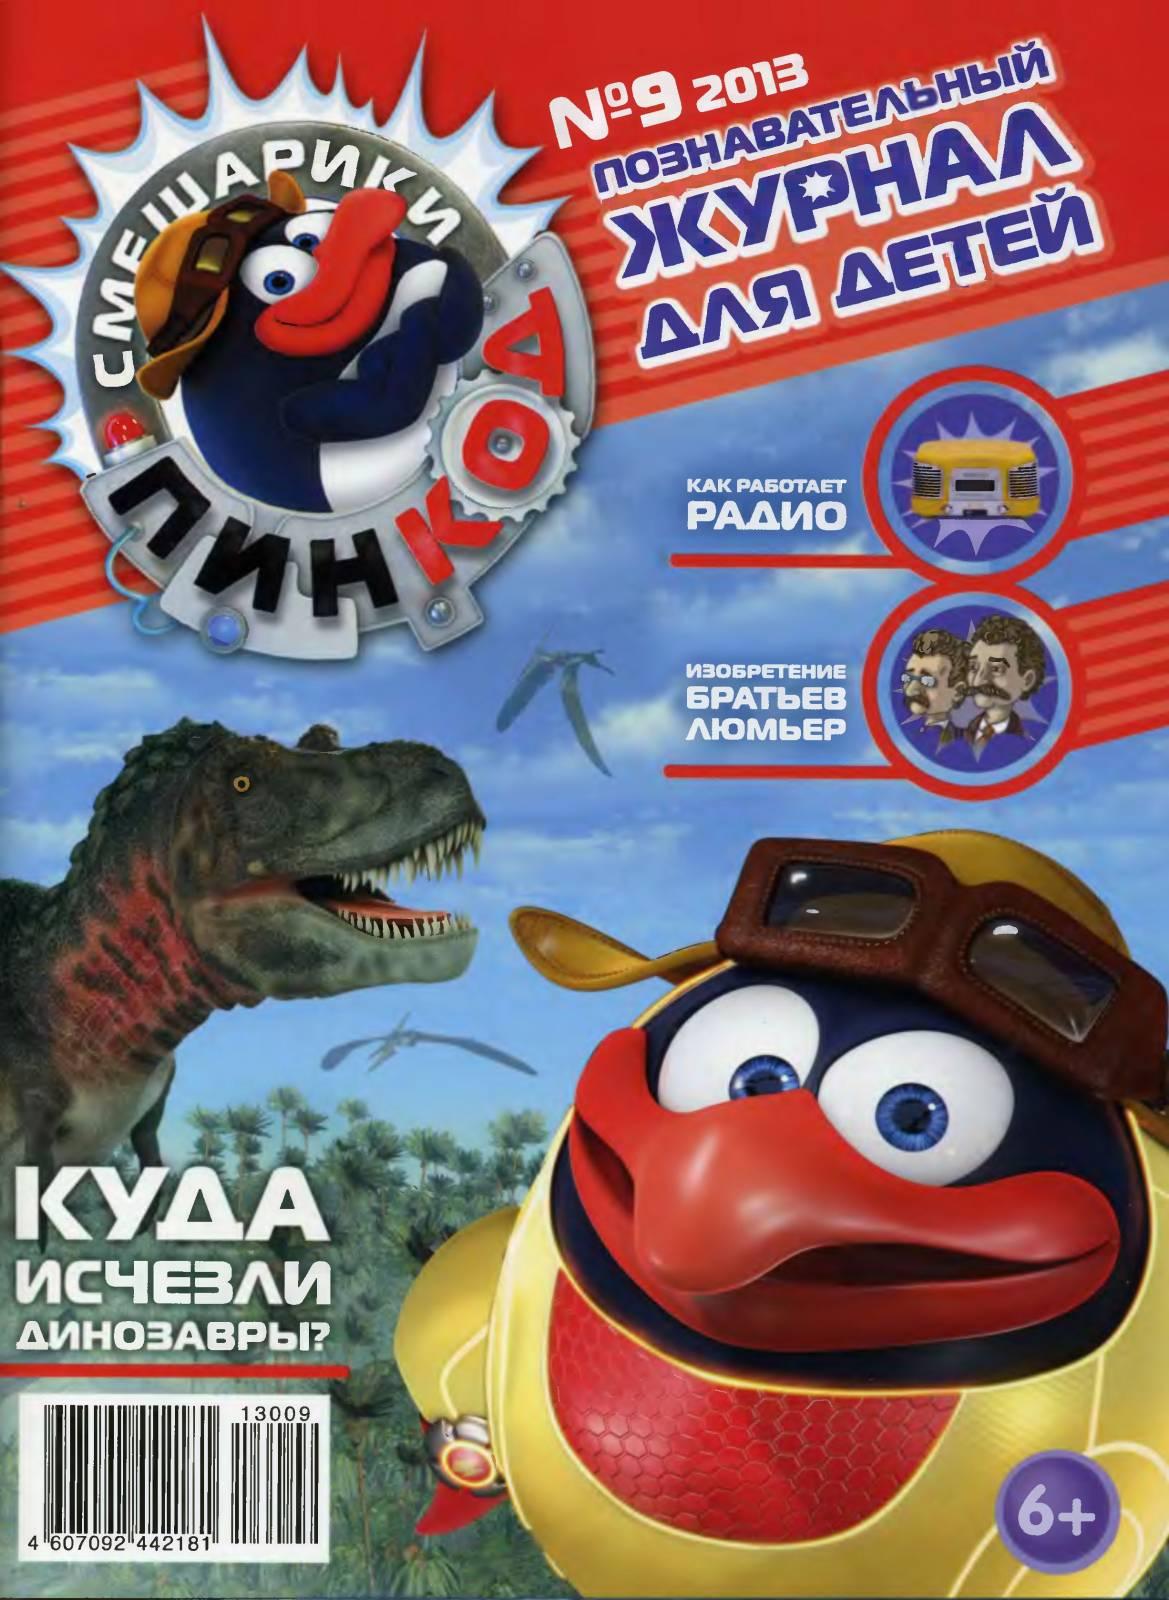 Смешарики Пин-код №9 (2013)Детские журналы,Комиксы - 27 Мая 2014 ...